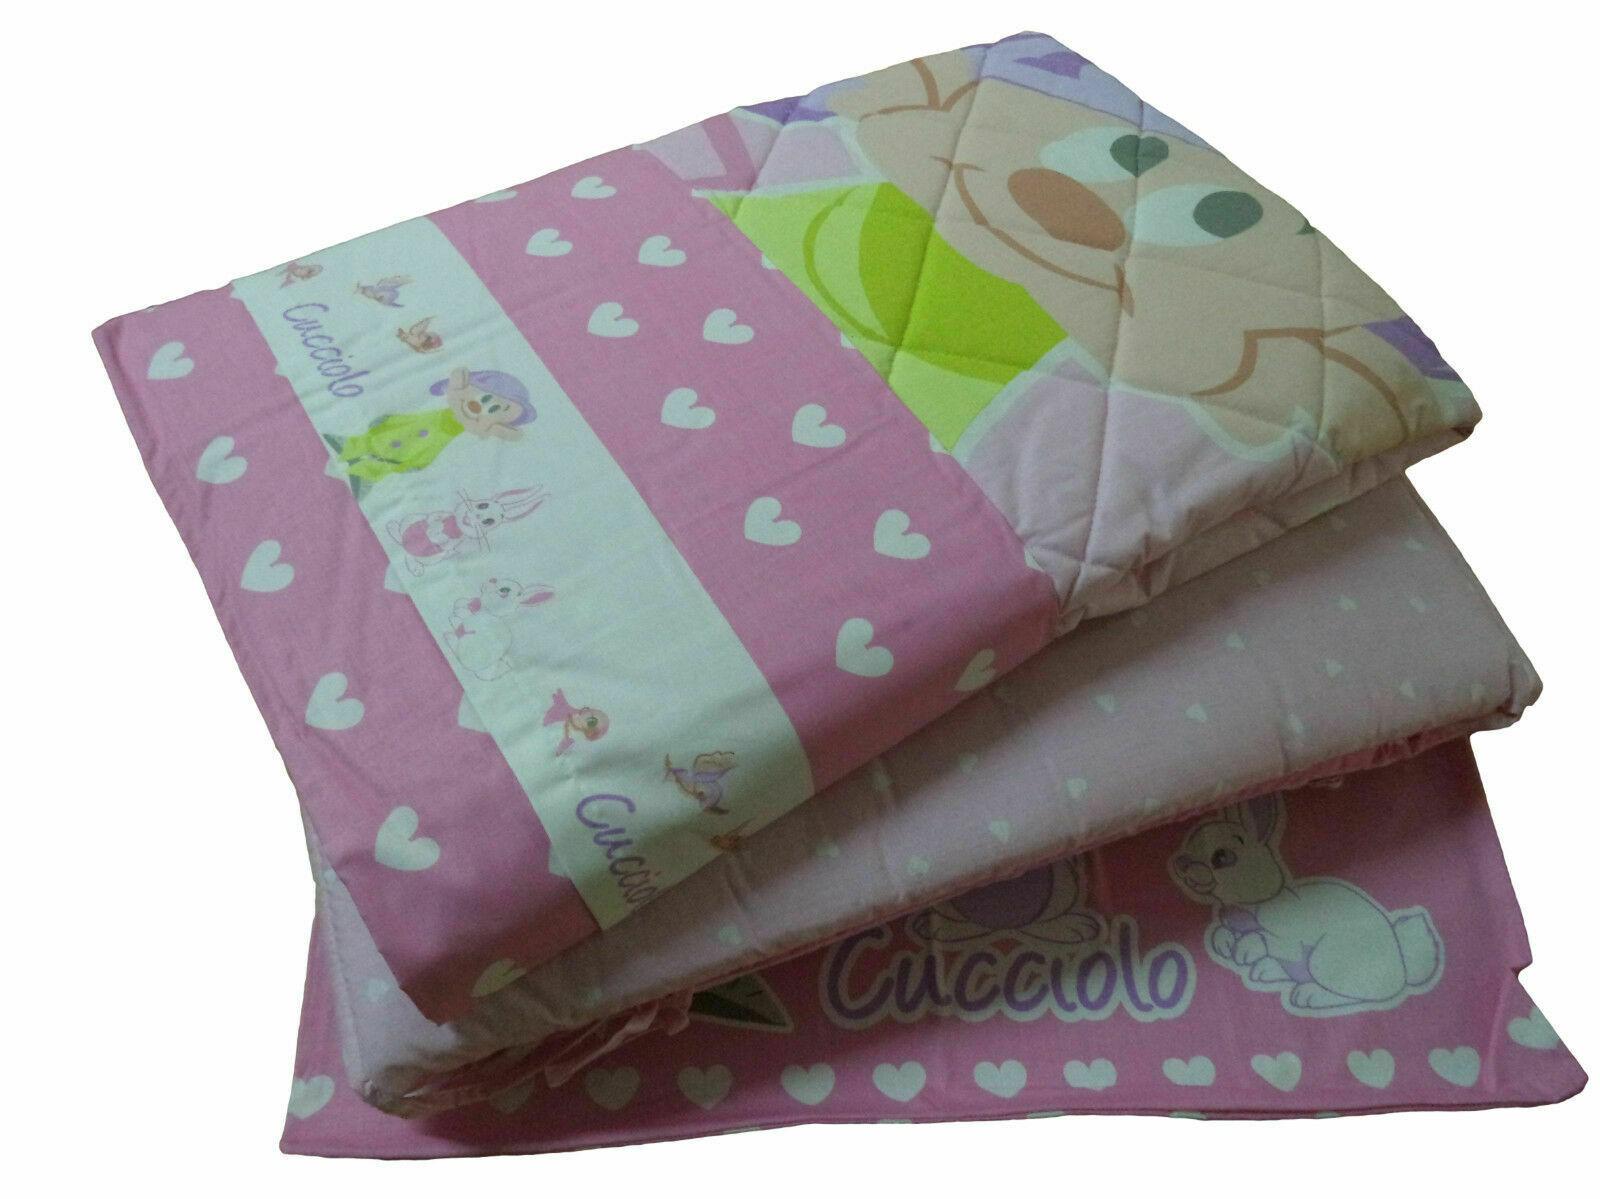 Coordinato Baby Culla Lettino DISNEY CUCCIOLO Trapuntino e paracolpi + Lenzuola